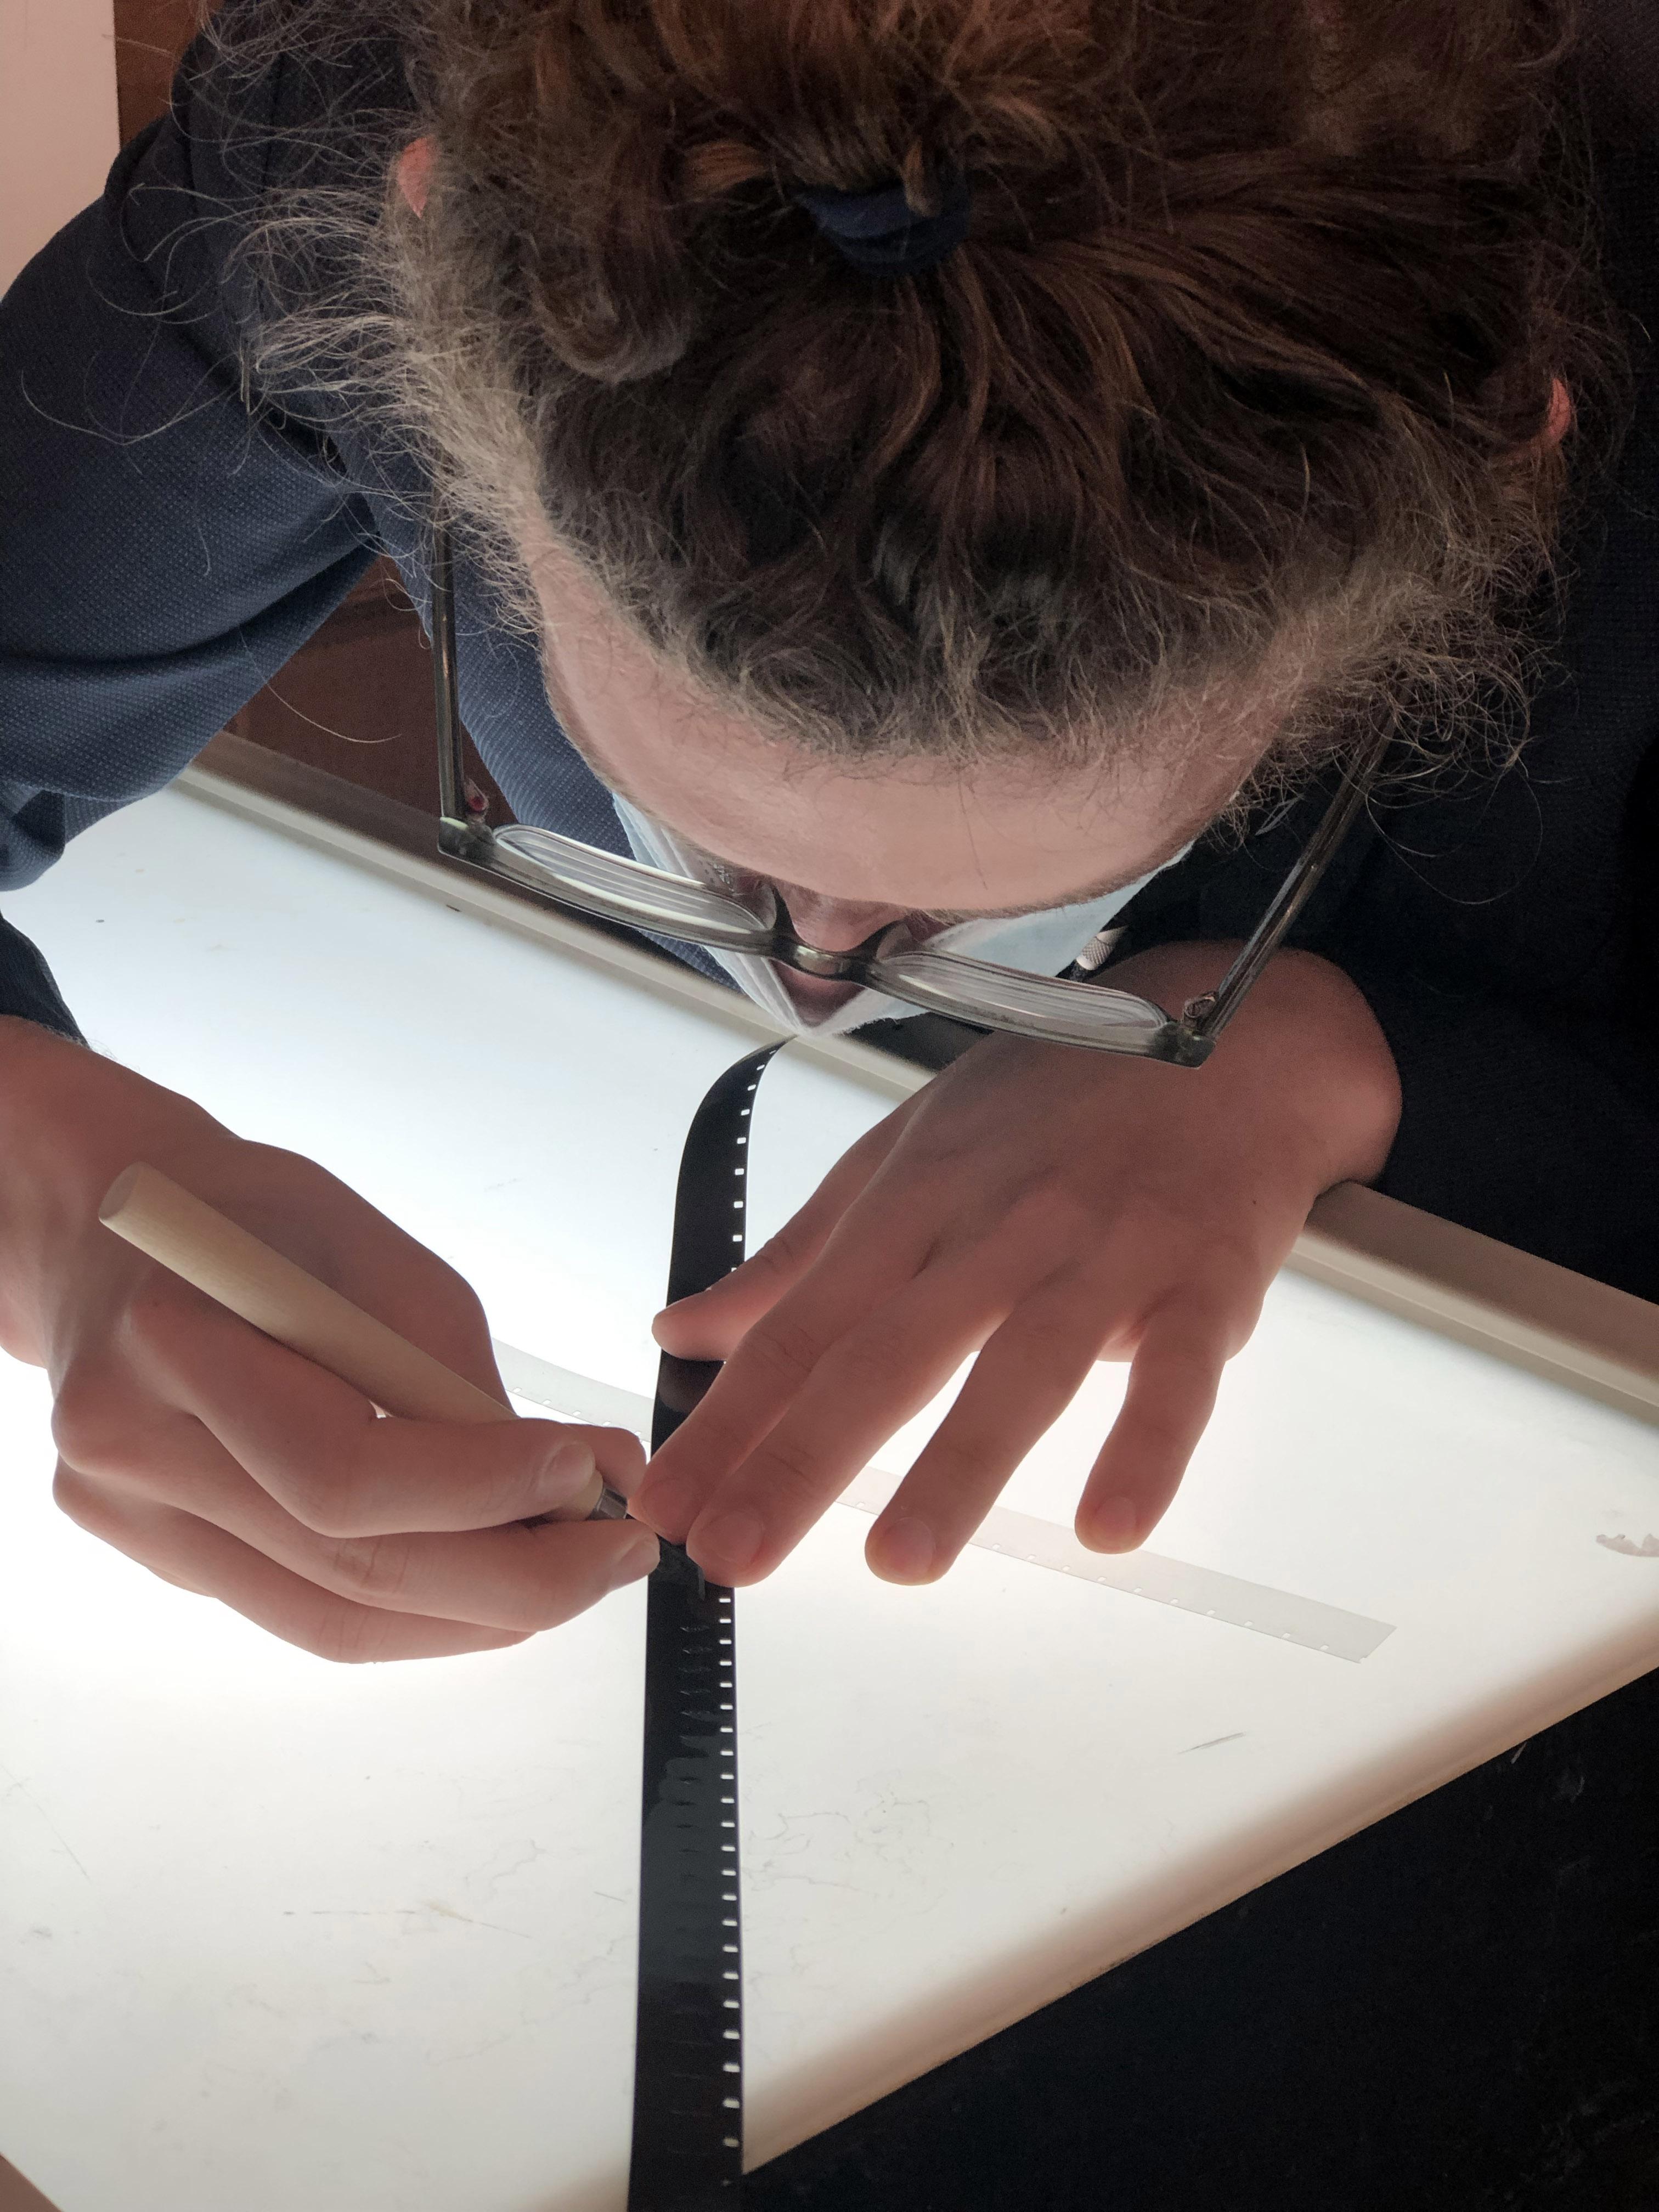 Female student drawing on film strip on lightbox